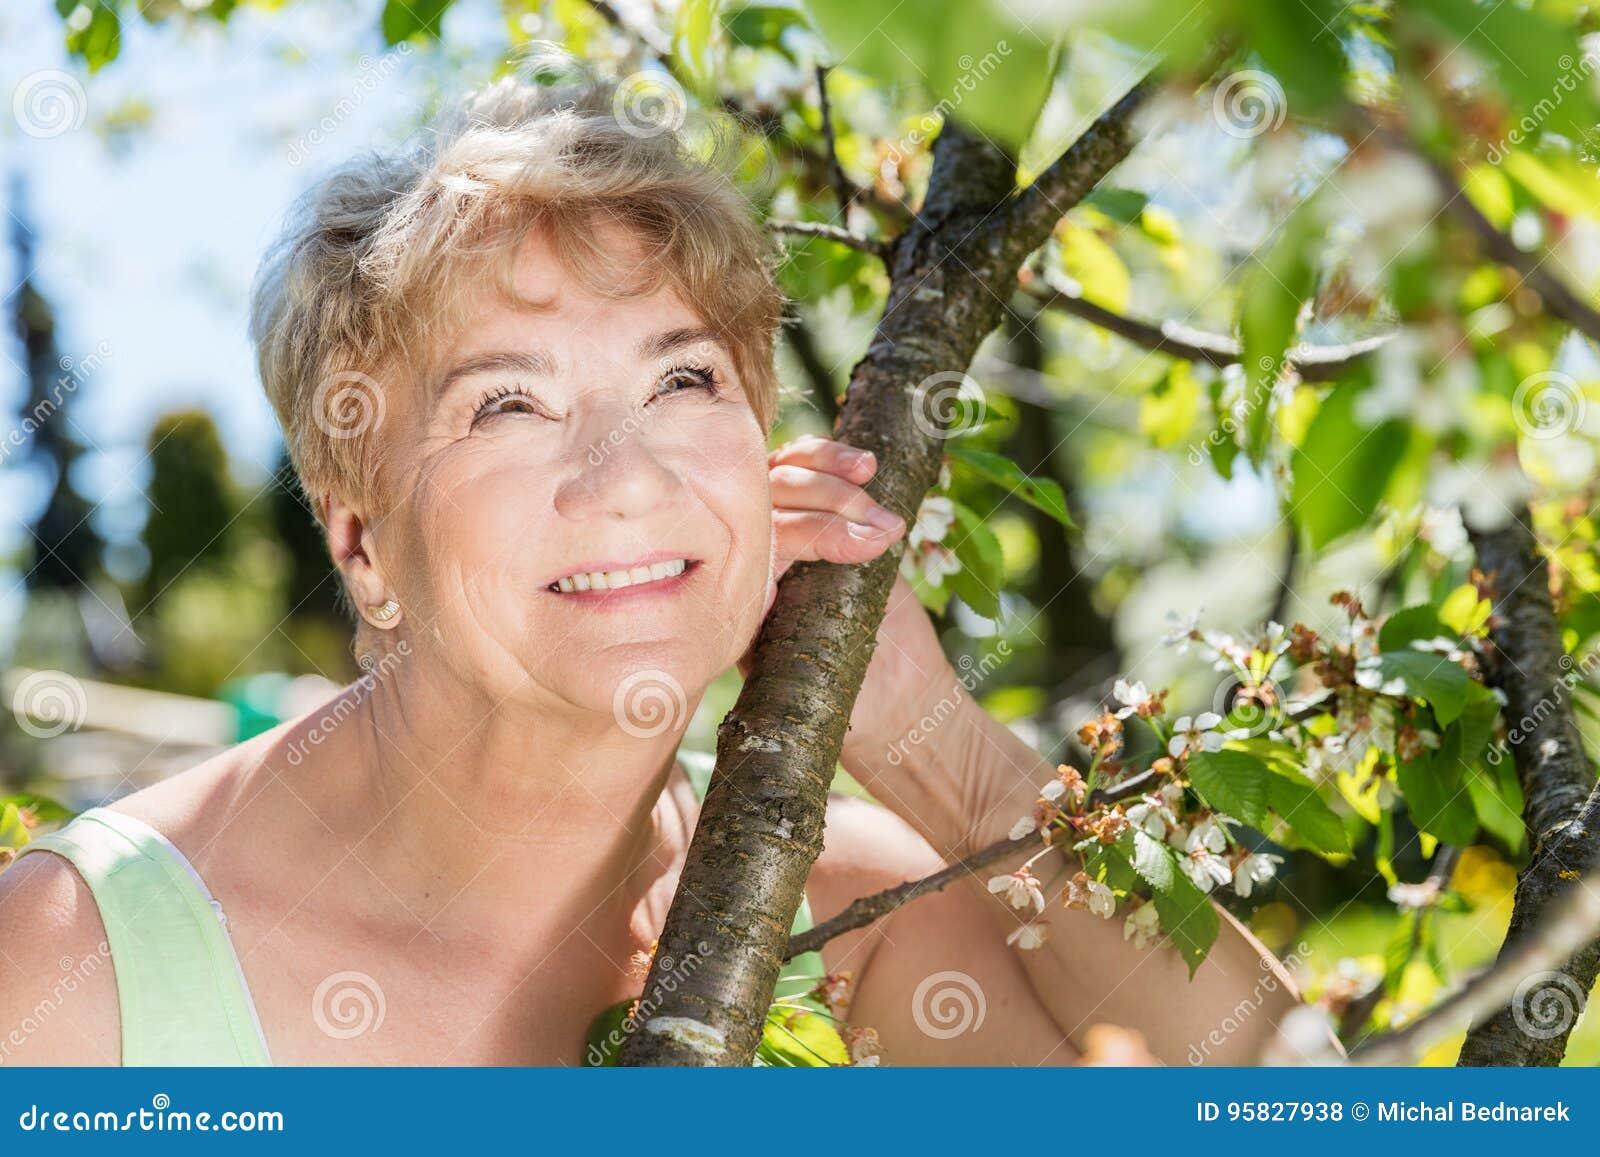 Attractive mature woman embracing nature. Grandmother